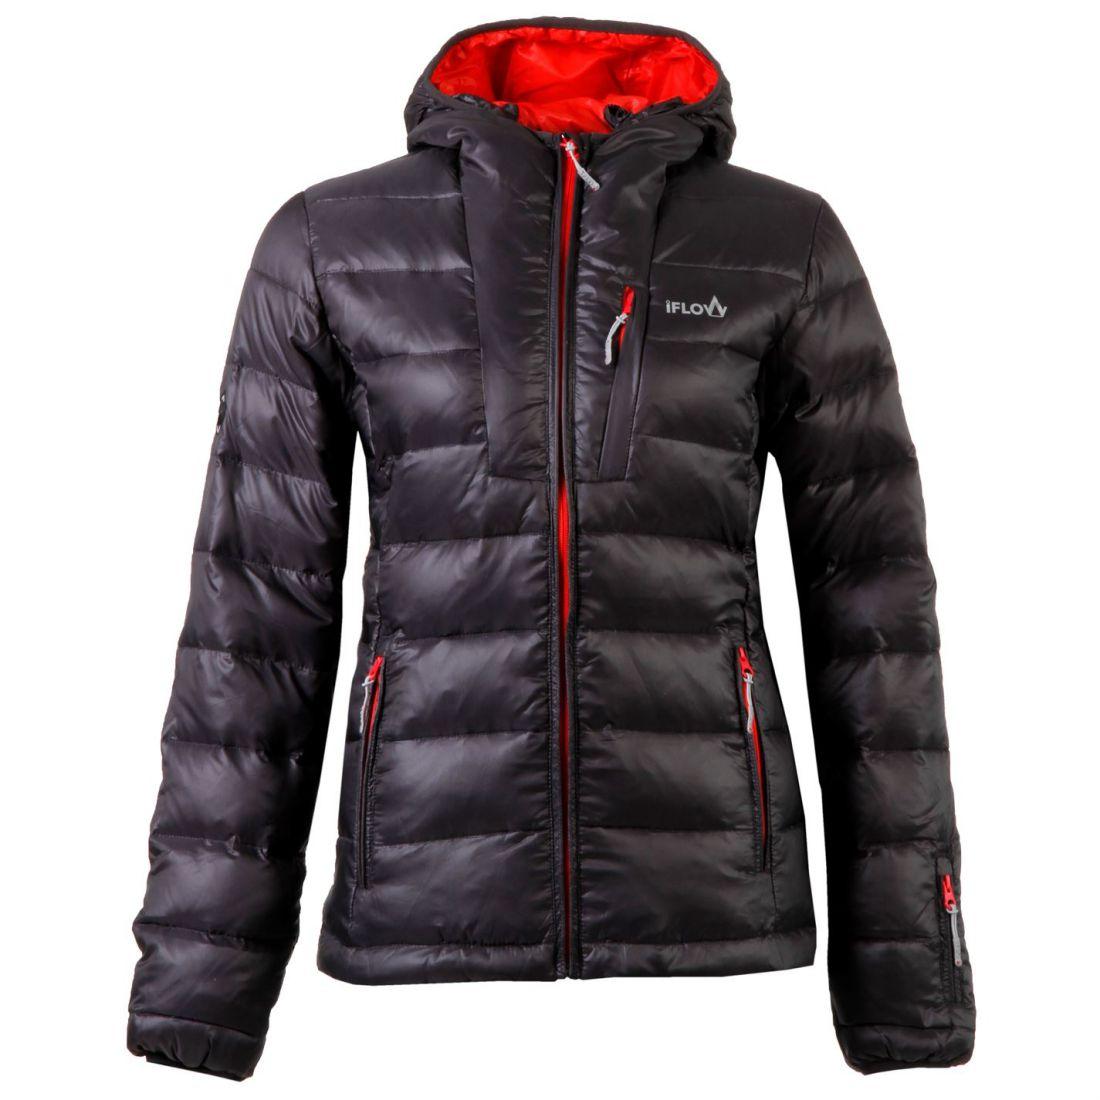 ba0a93209 Details about IFlow Superlight Jkt Ladies Down Jacket Coat Top